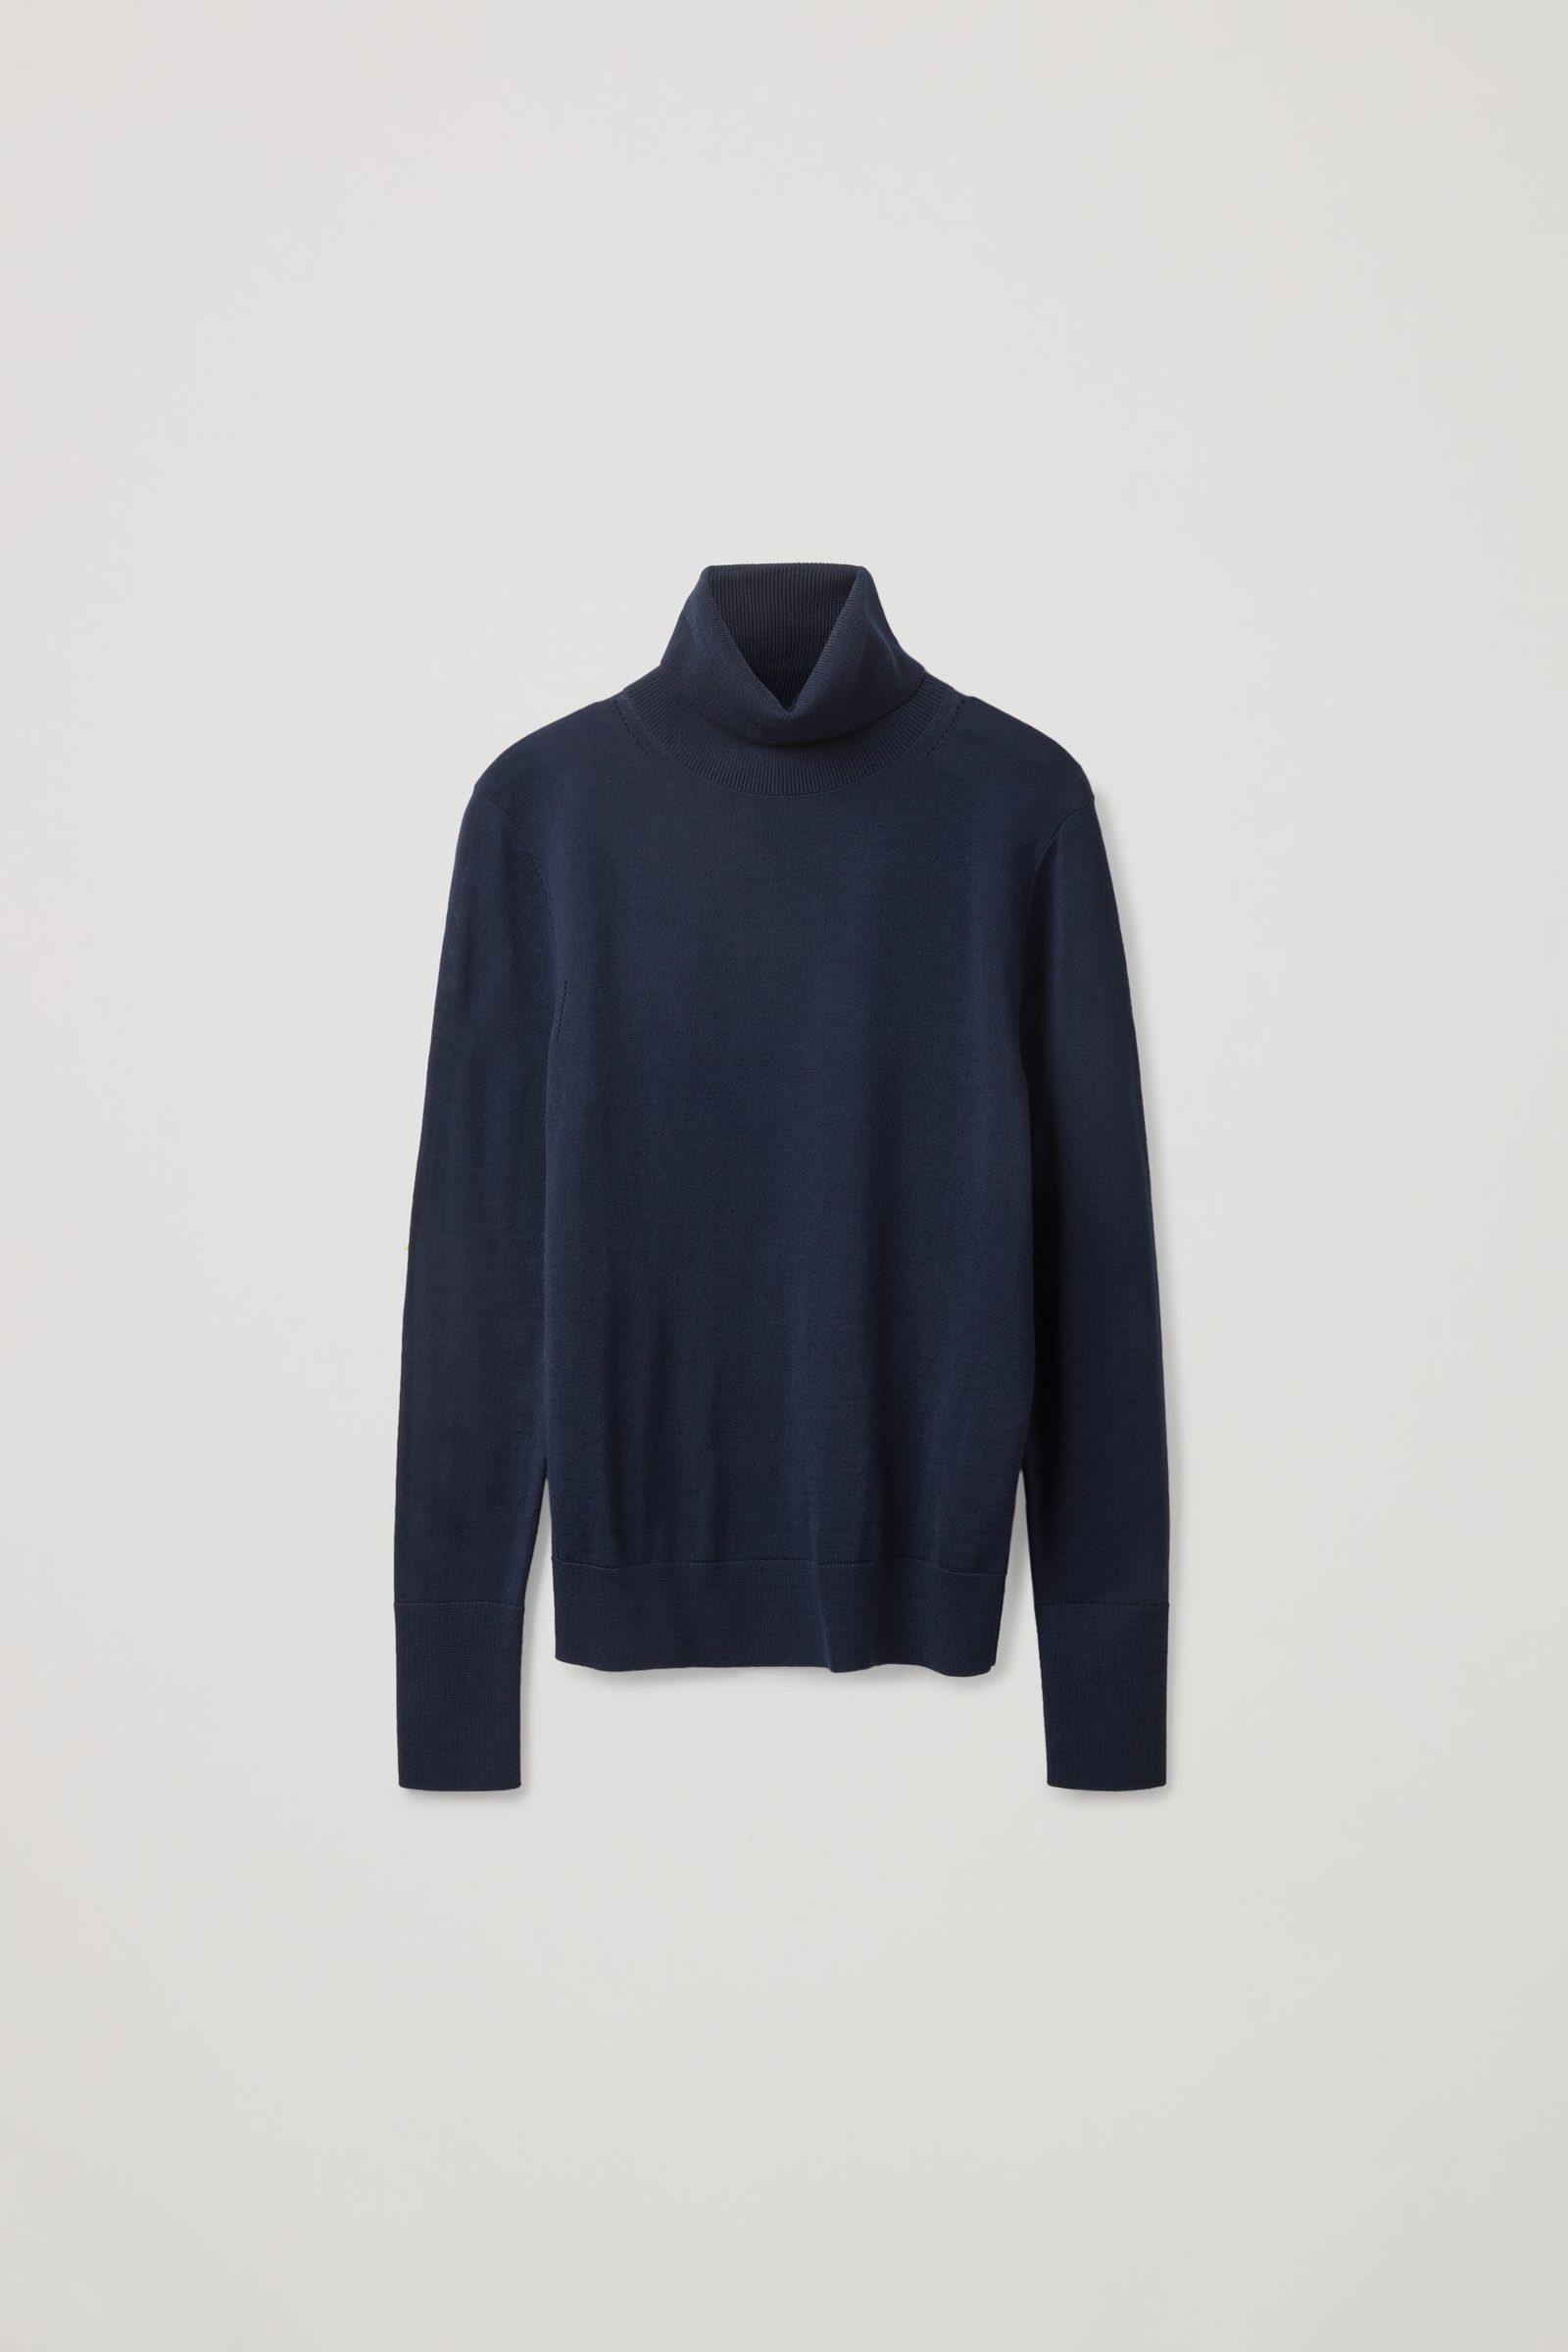 COS 슬림 핏 폴로 넥 스웨터의 네이비컬러 Product입니다.